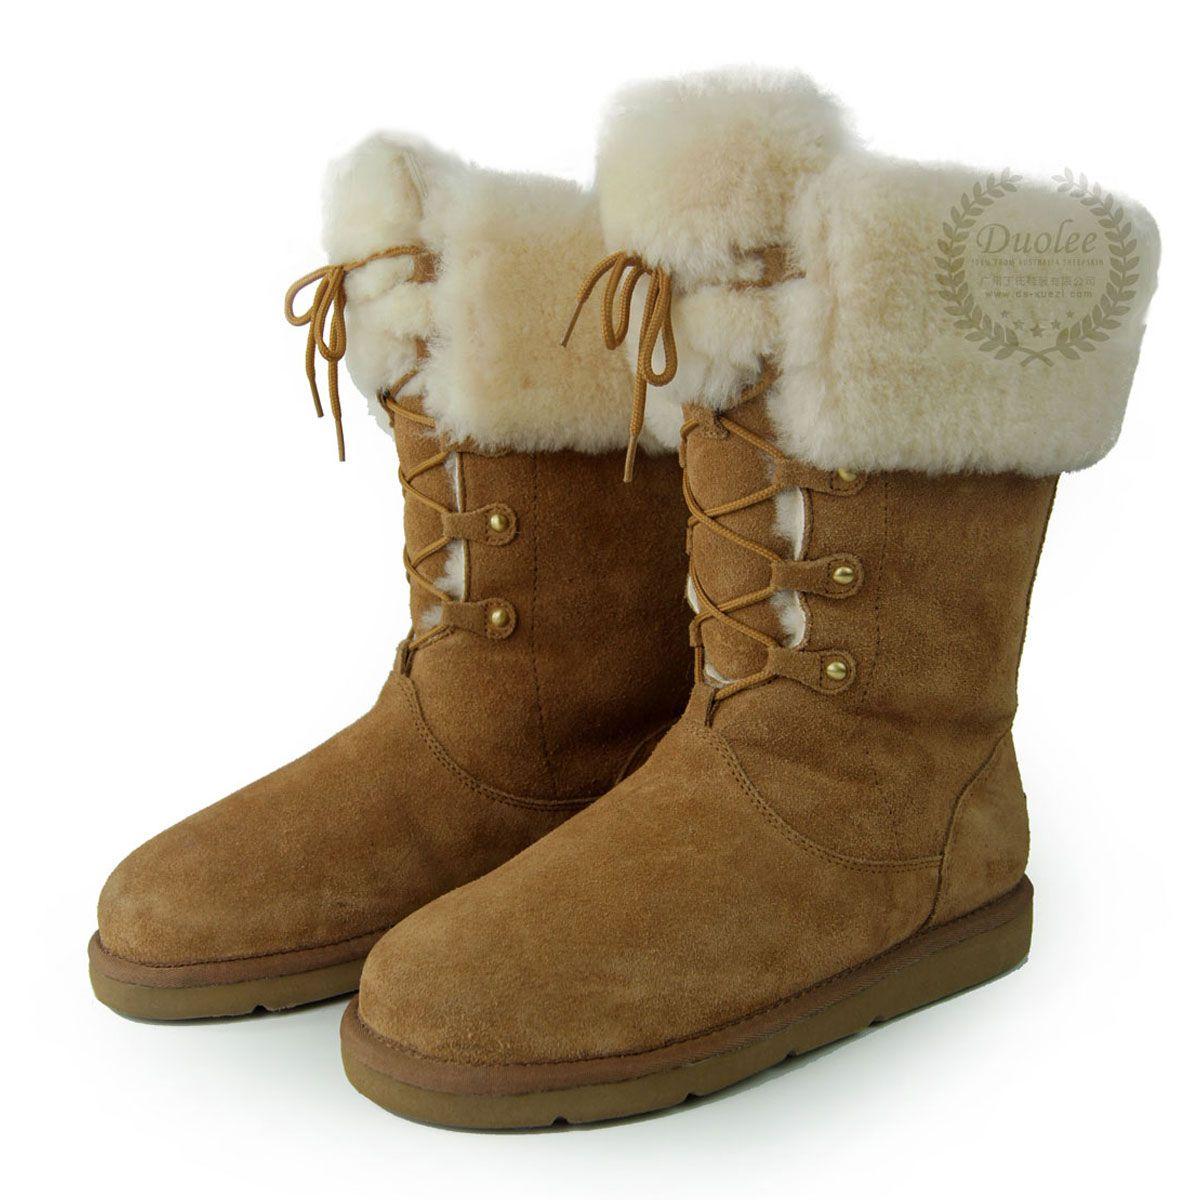 Fashion Ladies Boots   Ladies Boots   Pinterest   Ladies boots ...